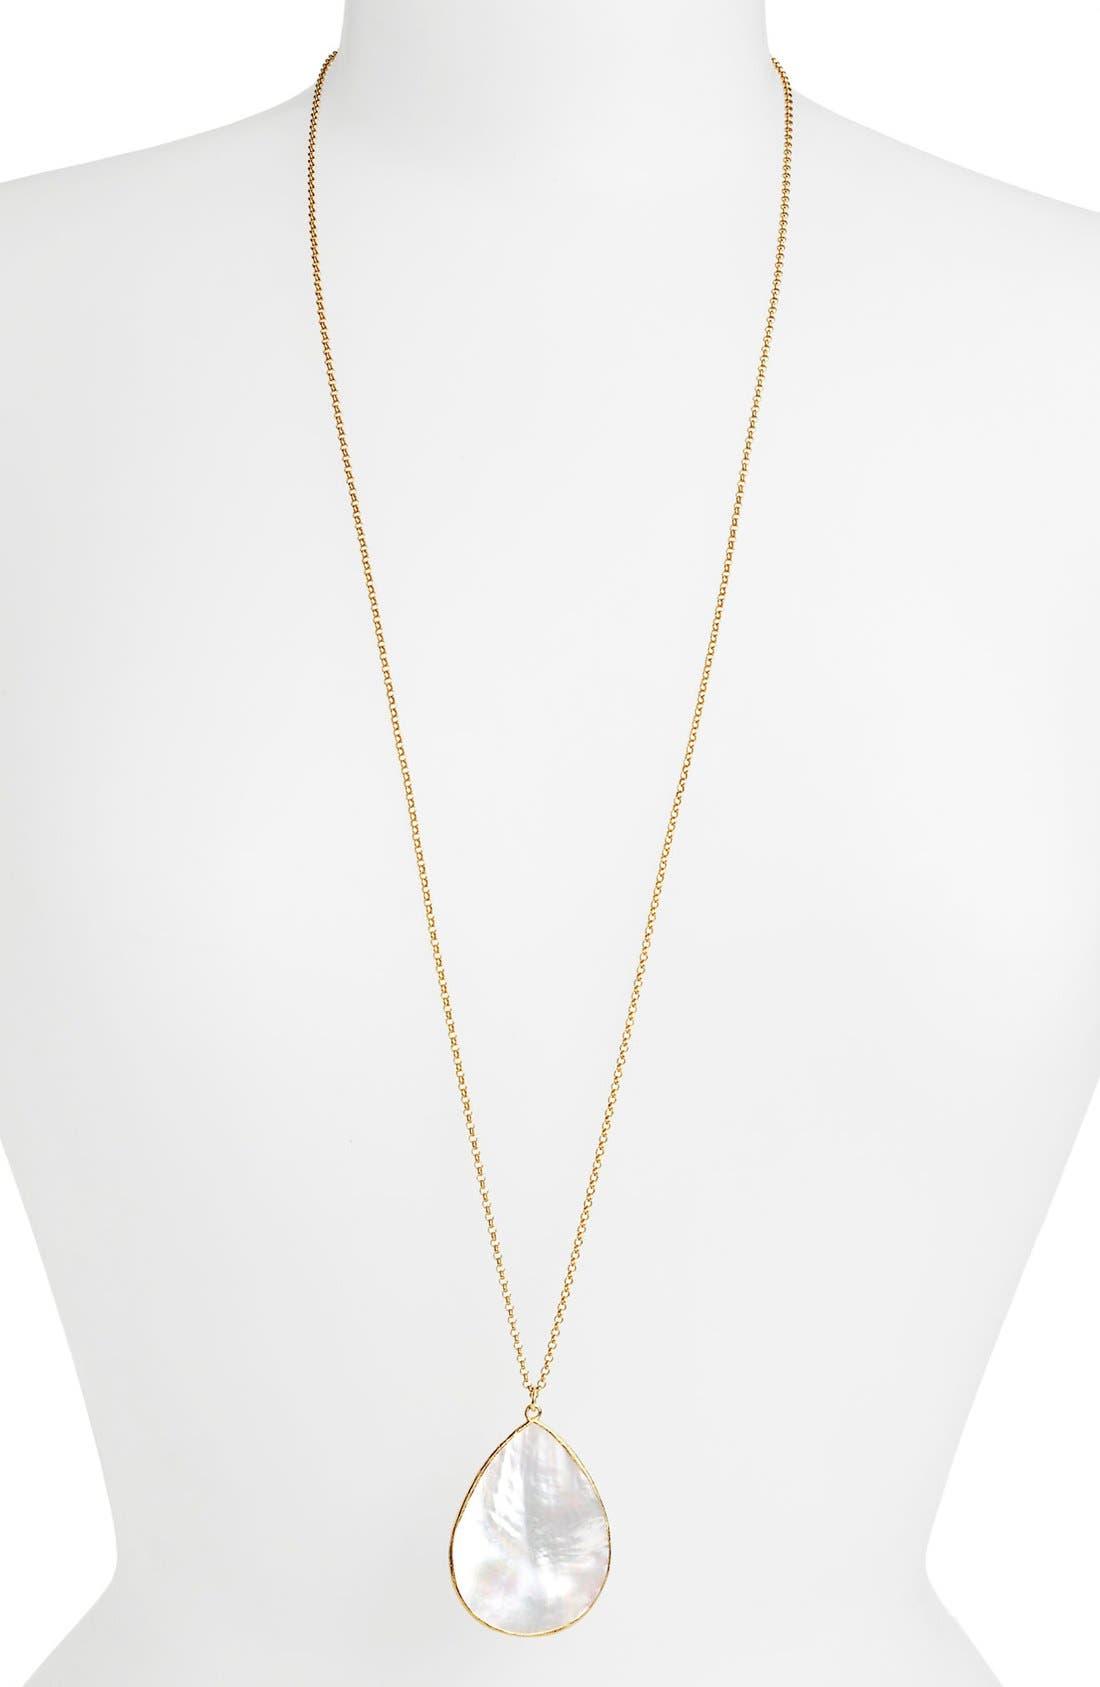 Main Image - Argento Vivo Long Teardrop Pendant Necklace